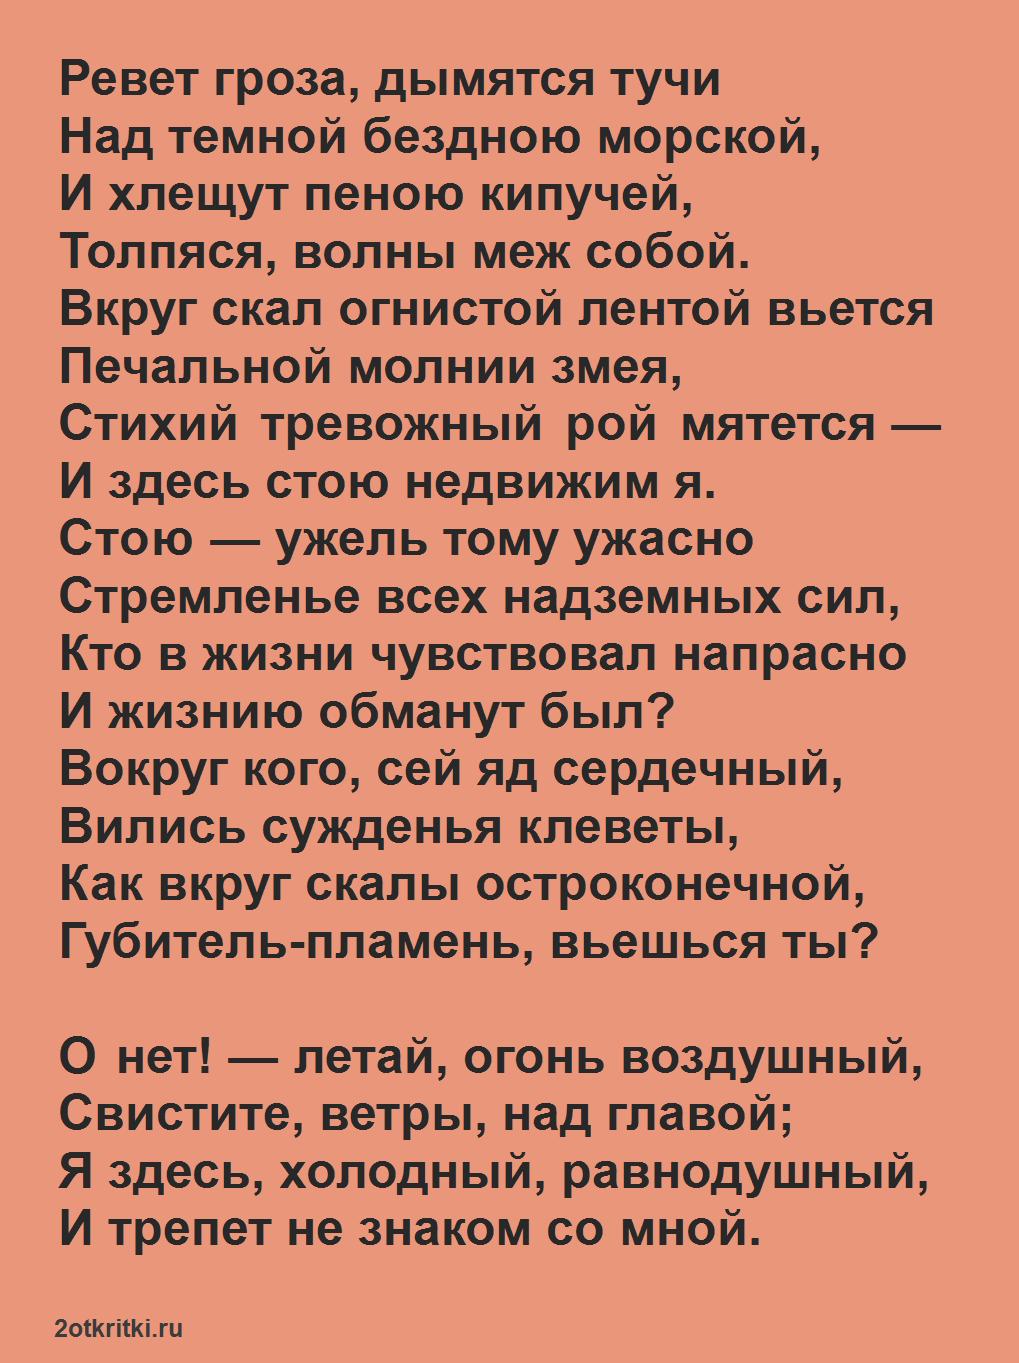 Стихи Лермонтова - Гроза